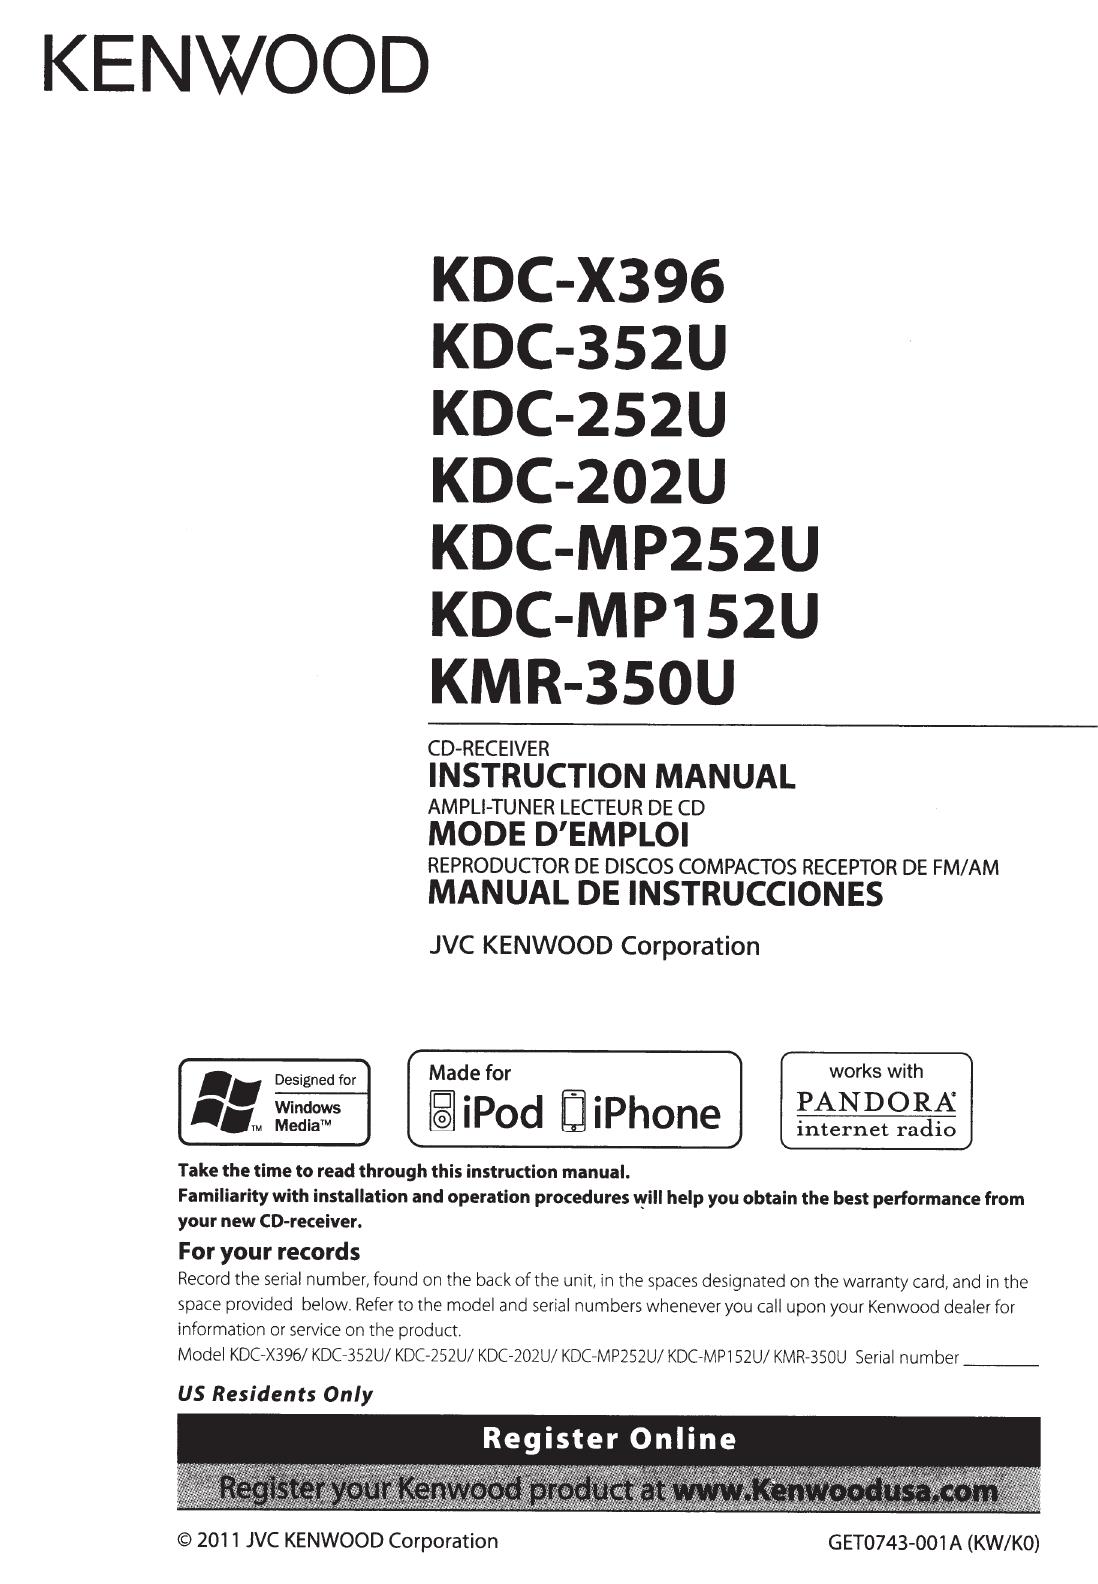 kenwood kdc 252u cd player wiring diagram user manual kenwood kdc 252u  24 pages   user manual kenwood kdc 252u  24 pages